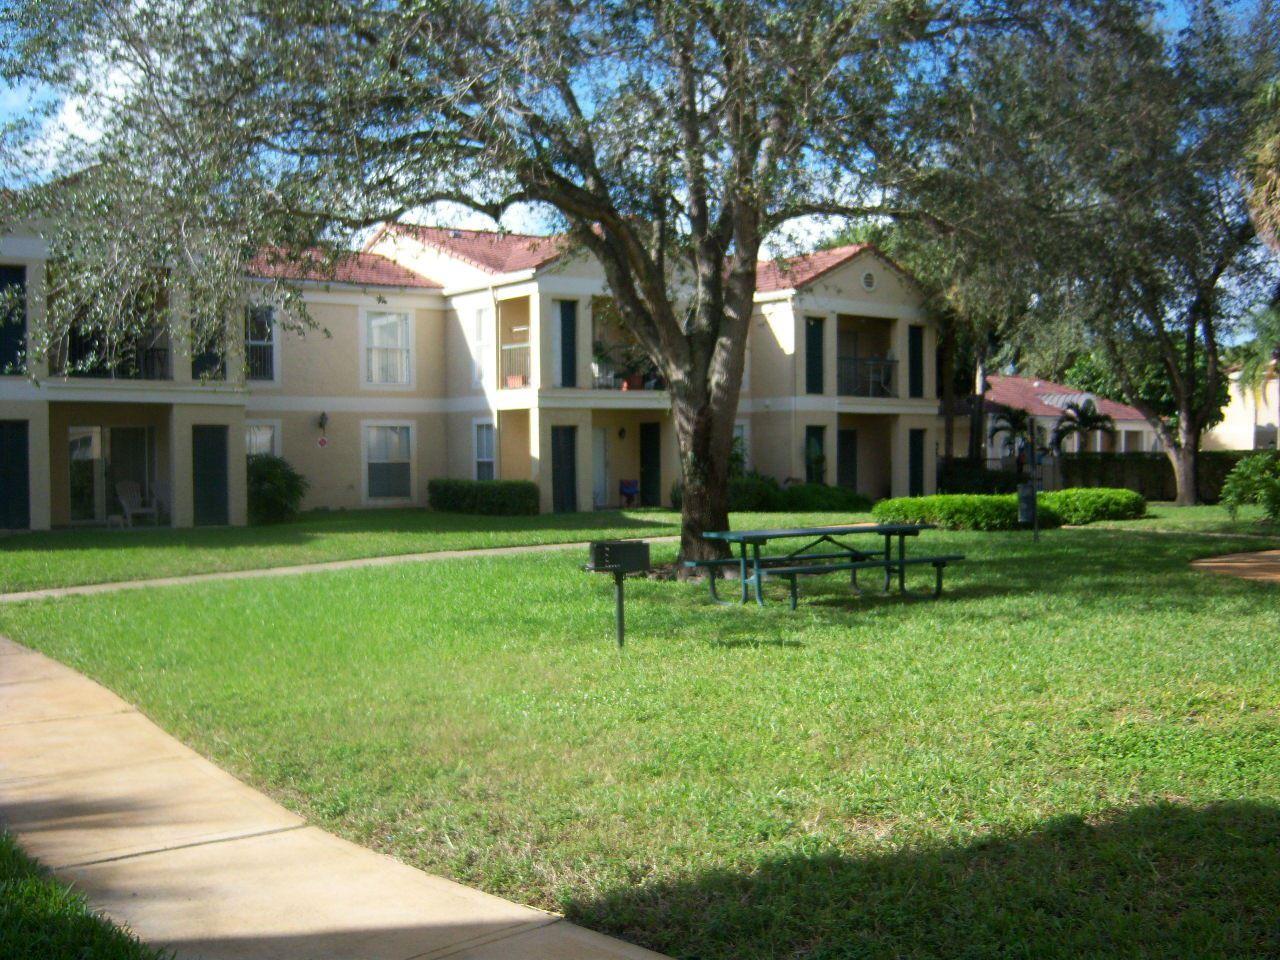 Photo of 805 Riverside Drive #1123, Coral Springs, FL 33071 (MLS # RX-10683369)